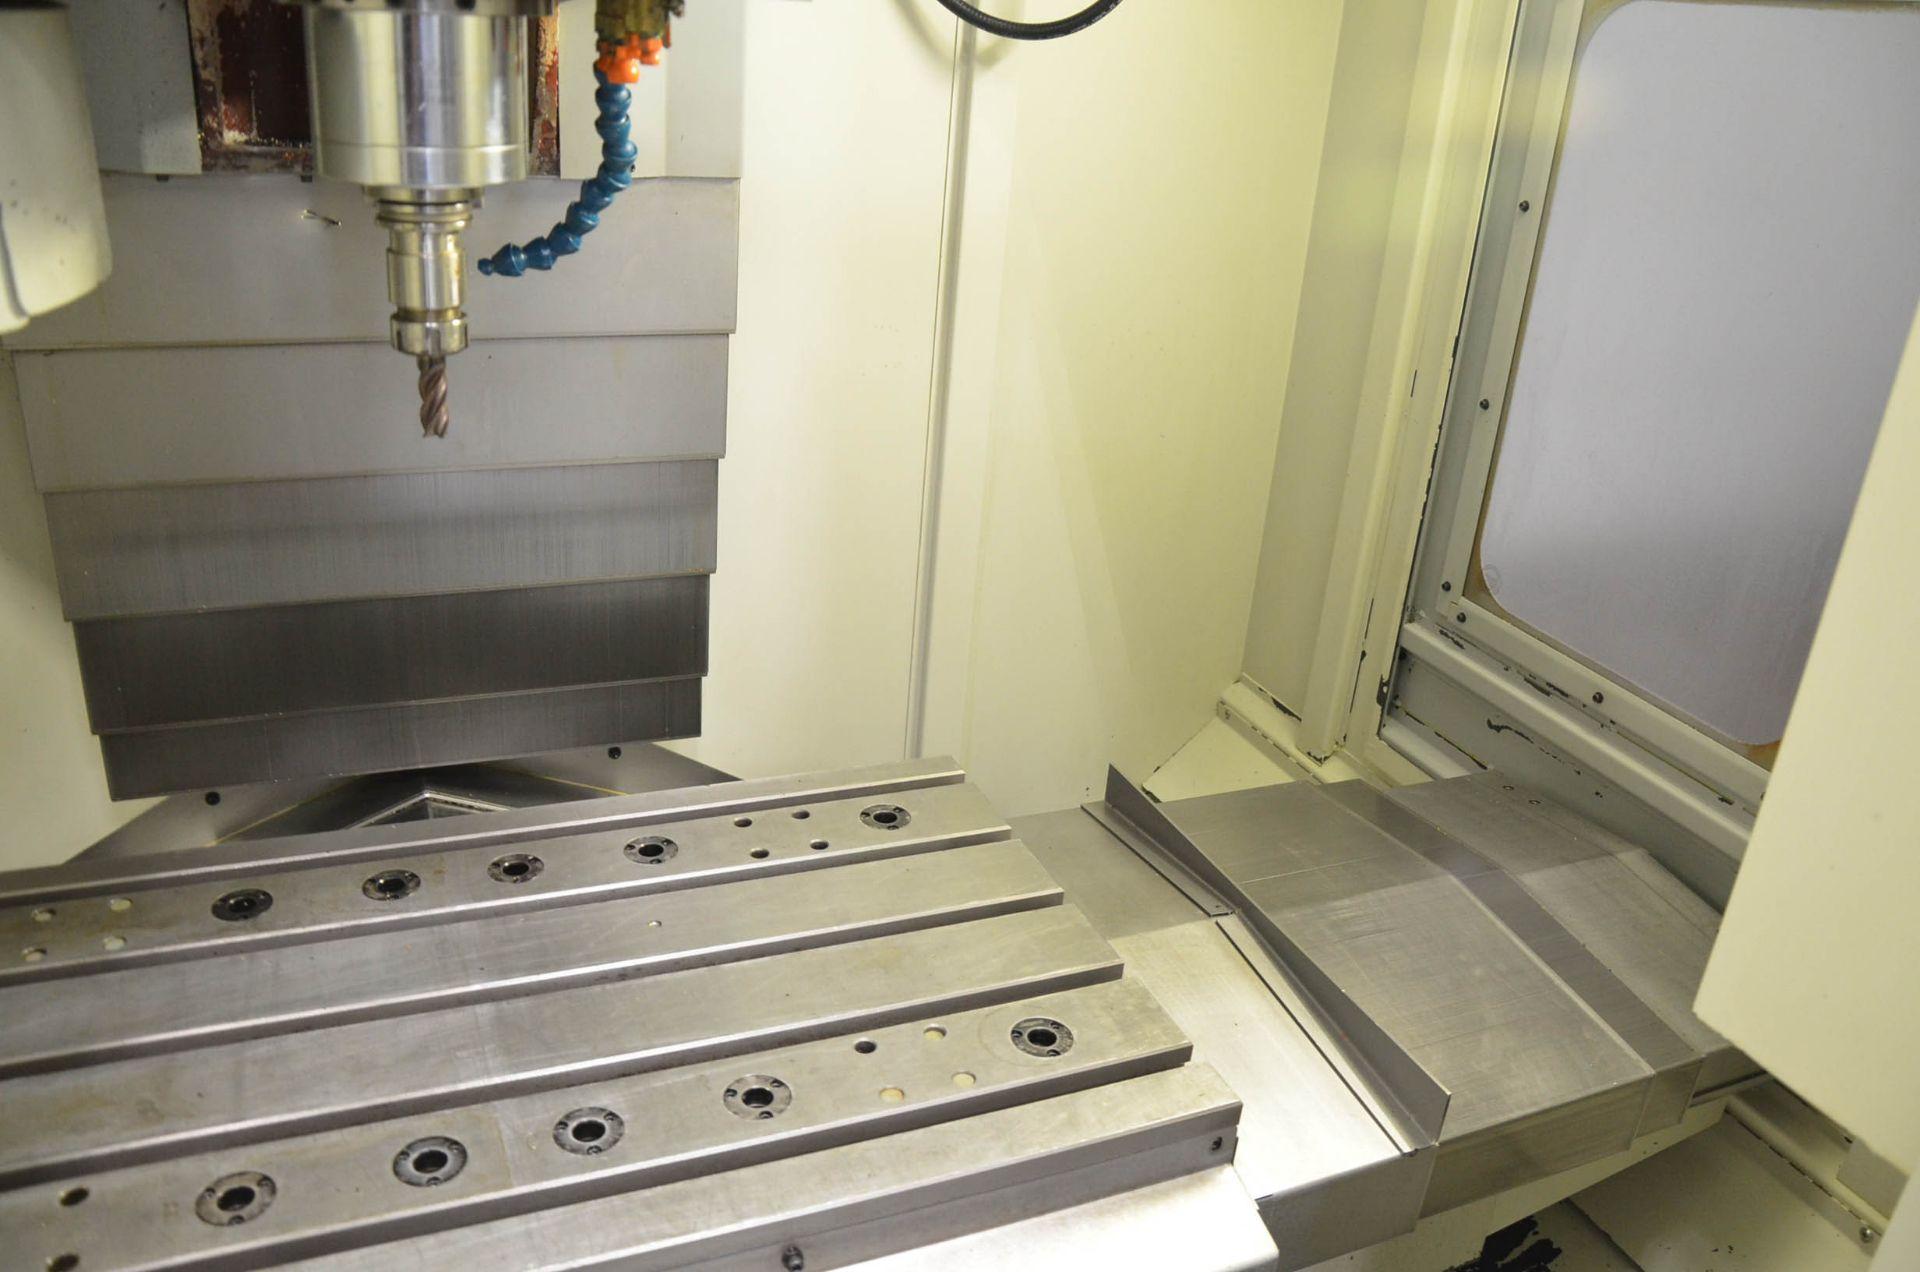 "SWI (2013) TRAK LPM CNC VERTICAL MACHINING CENTER WITH PROTO TRAK PMX CNC CONTROL, 19.5"" X 35.5"" - Image 6 of 9"